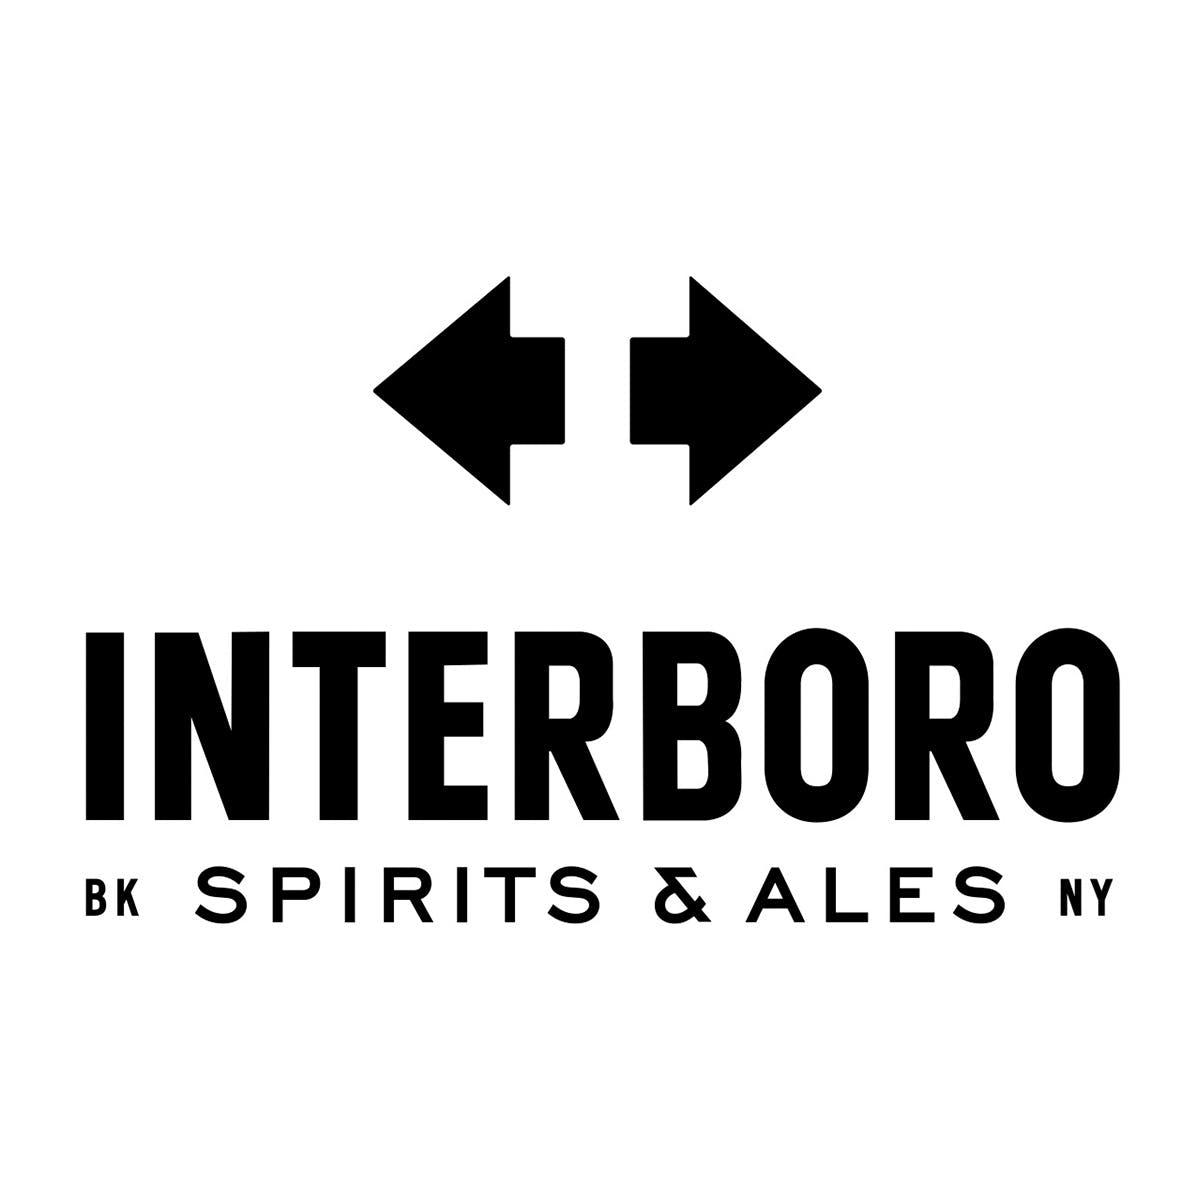 interboro_website (1).jpg